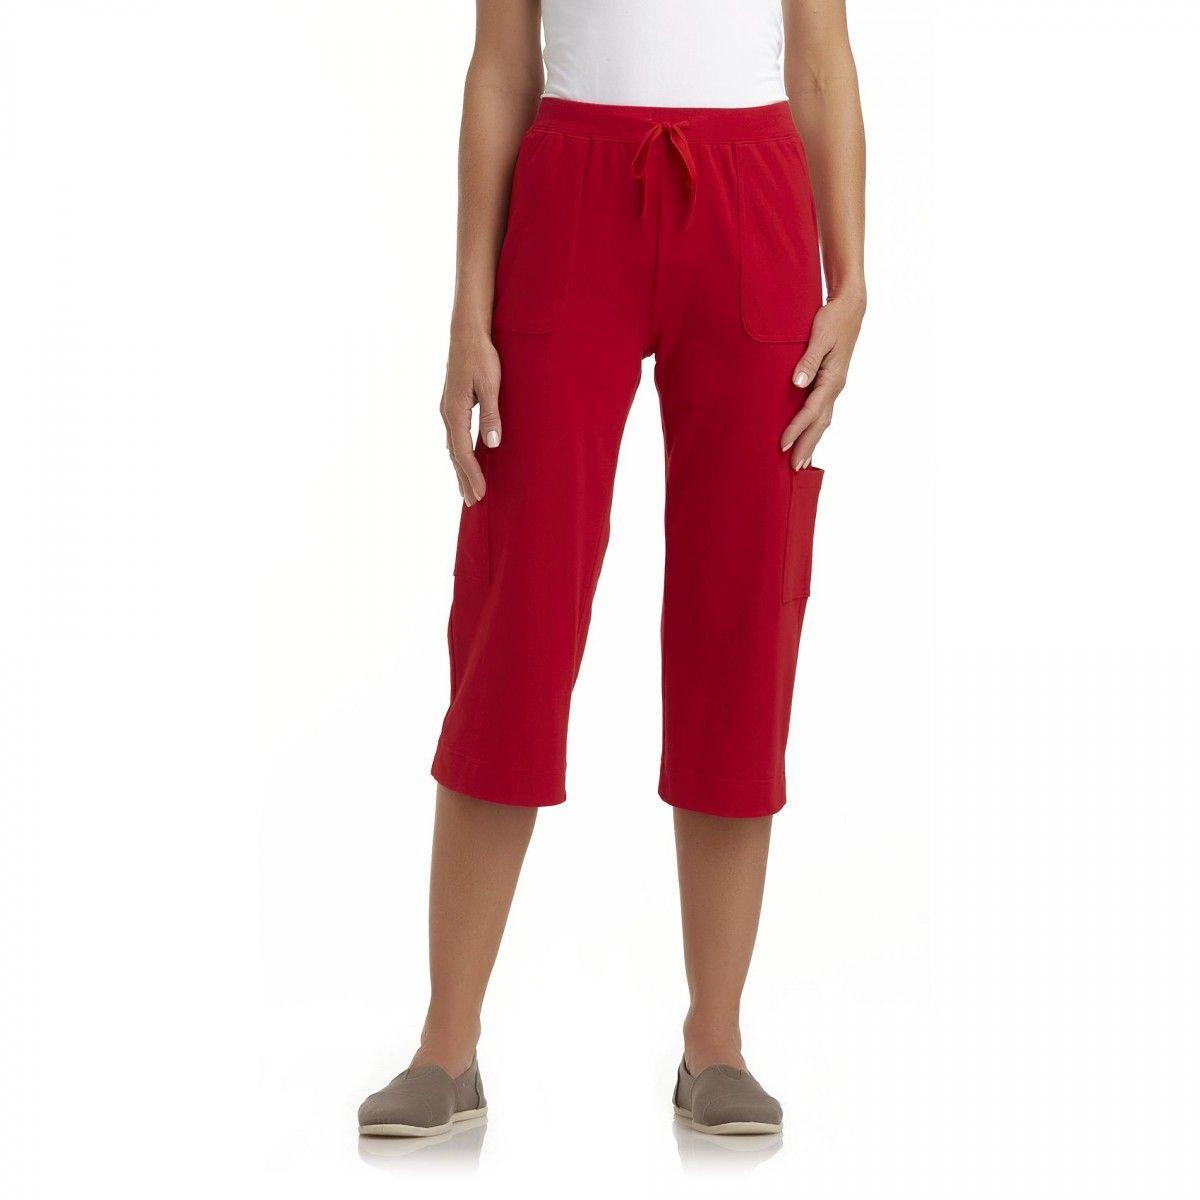 kmart basic editions womens shorts